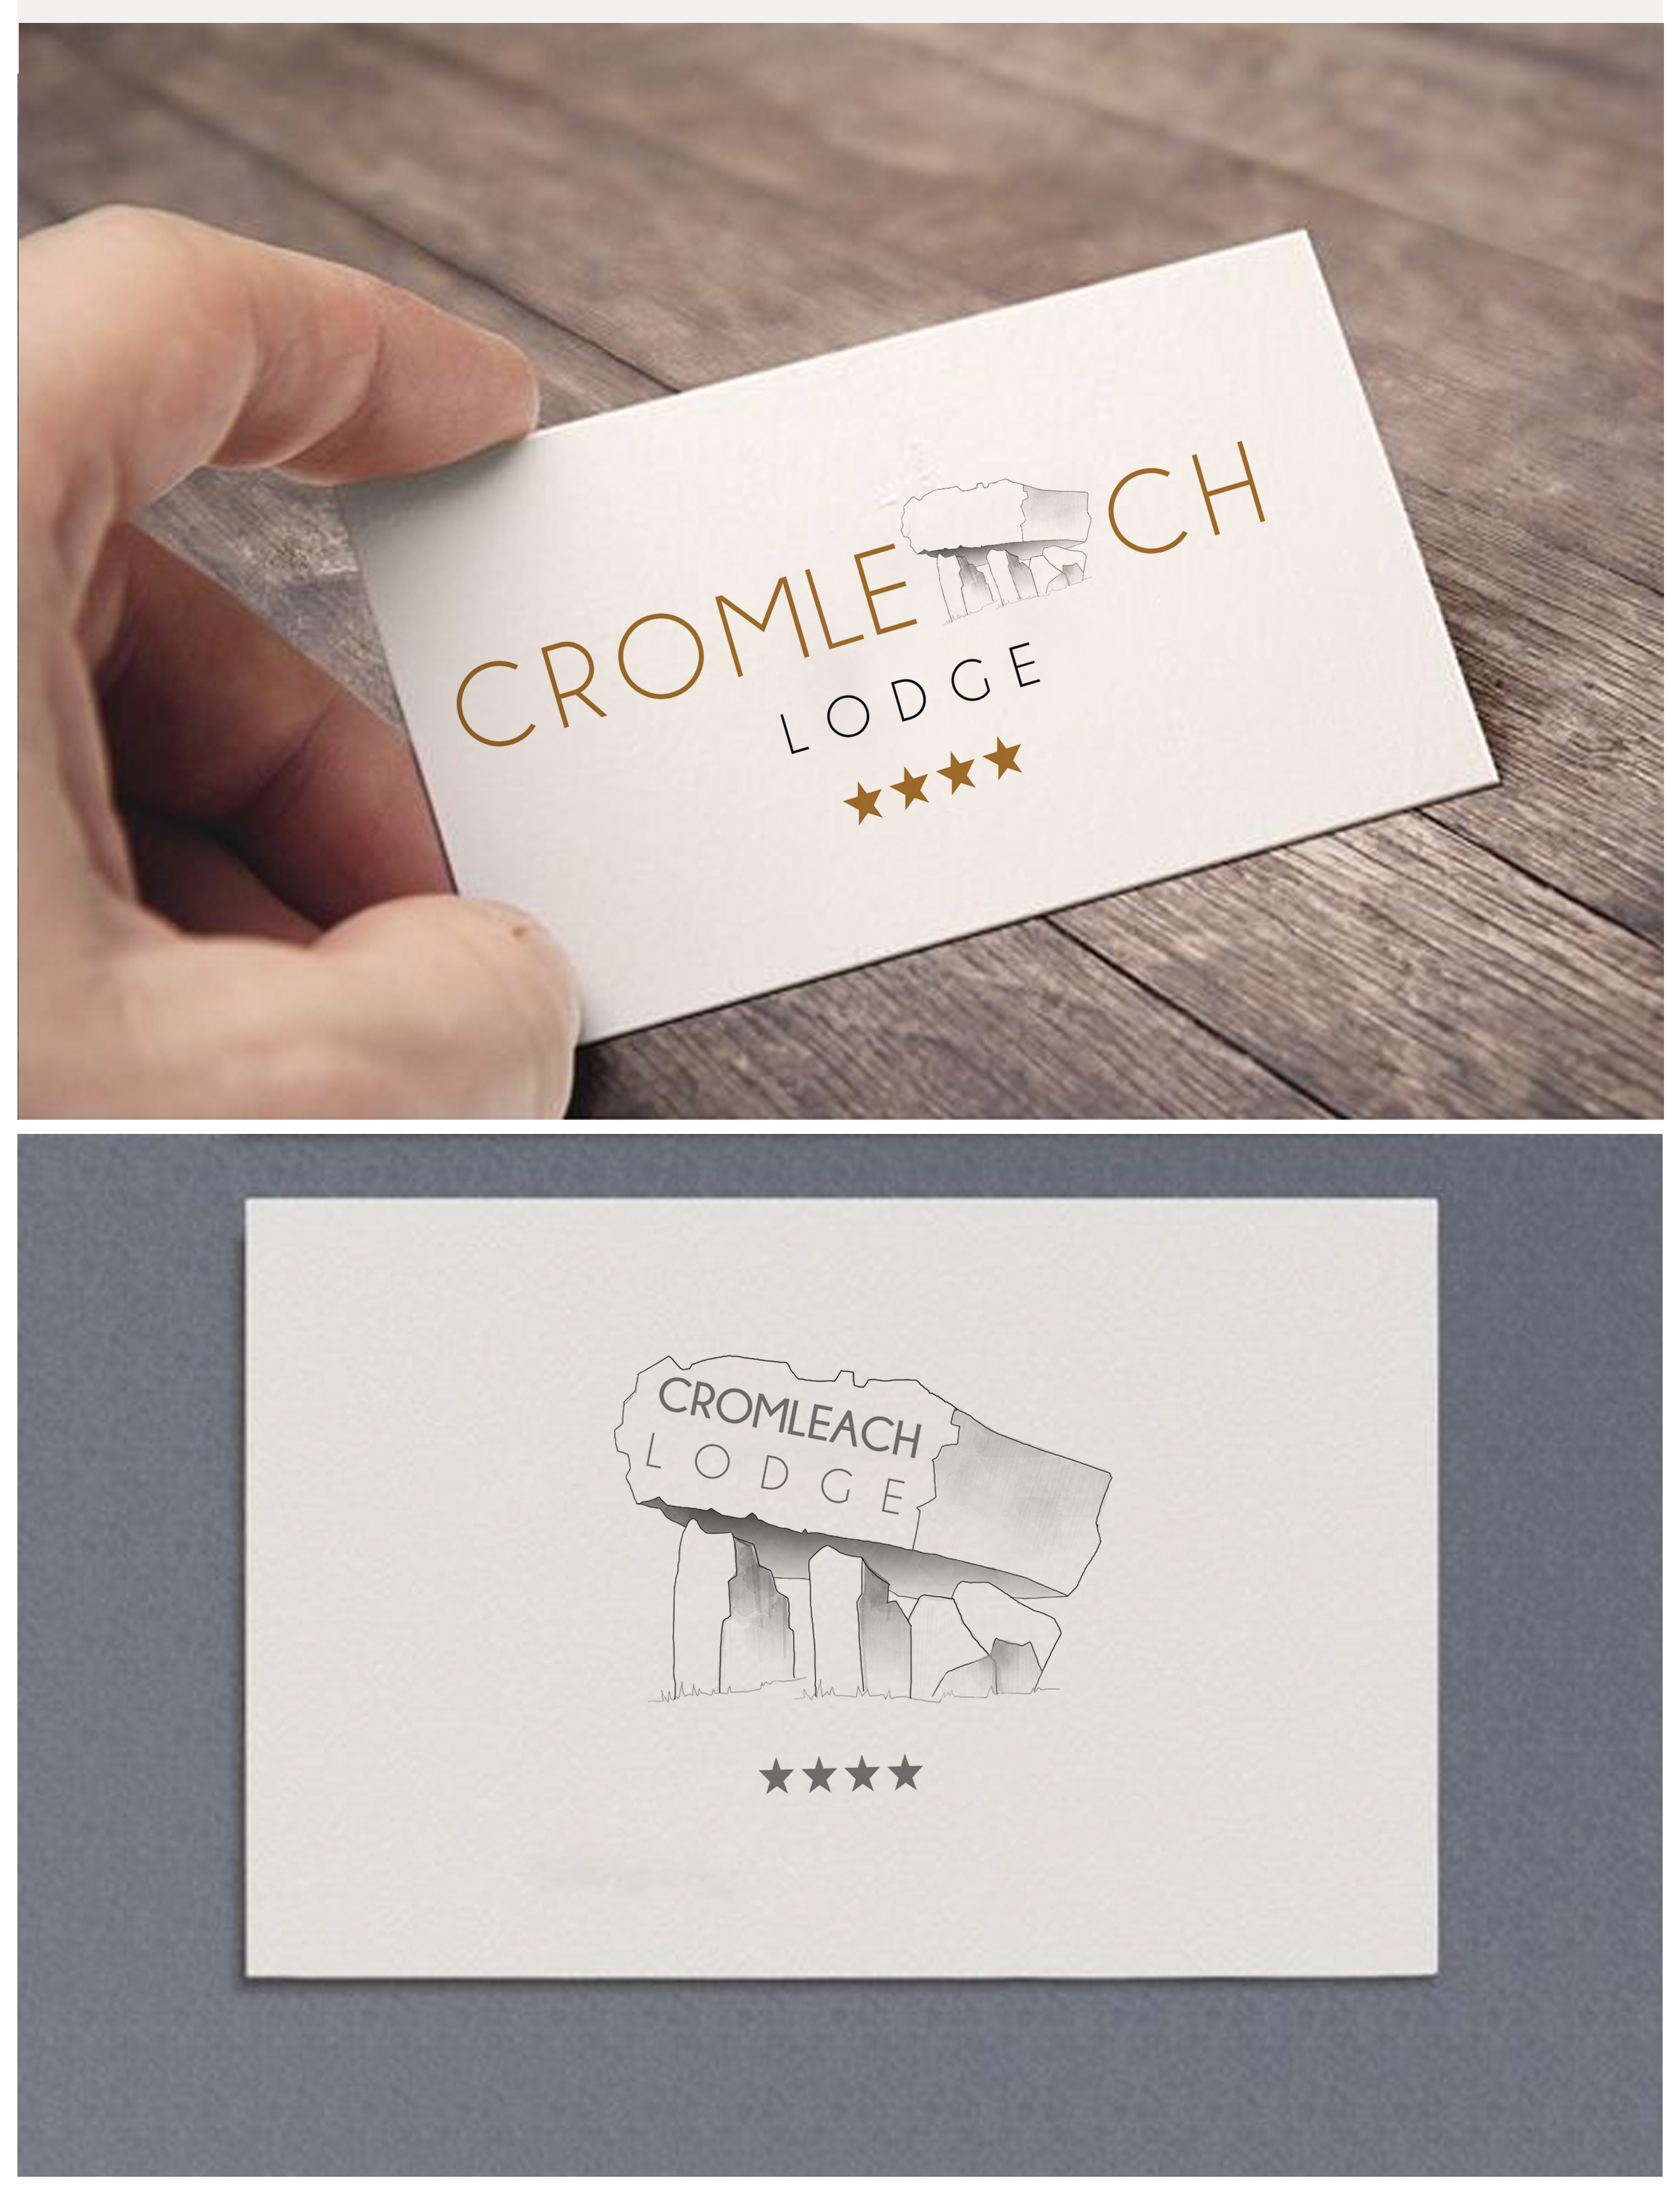 Cromleach lodge logo design